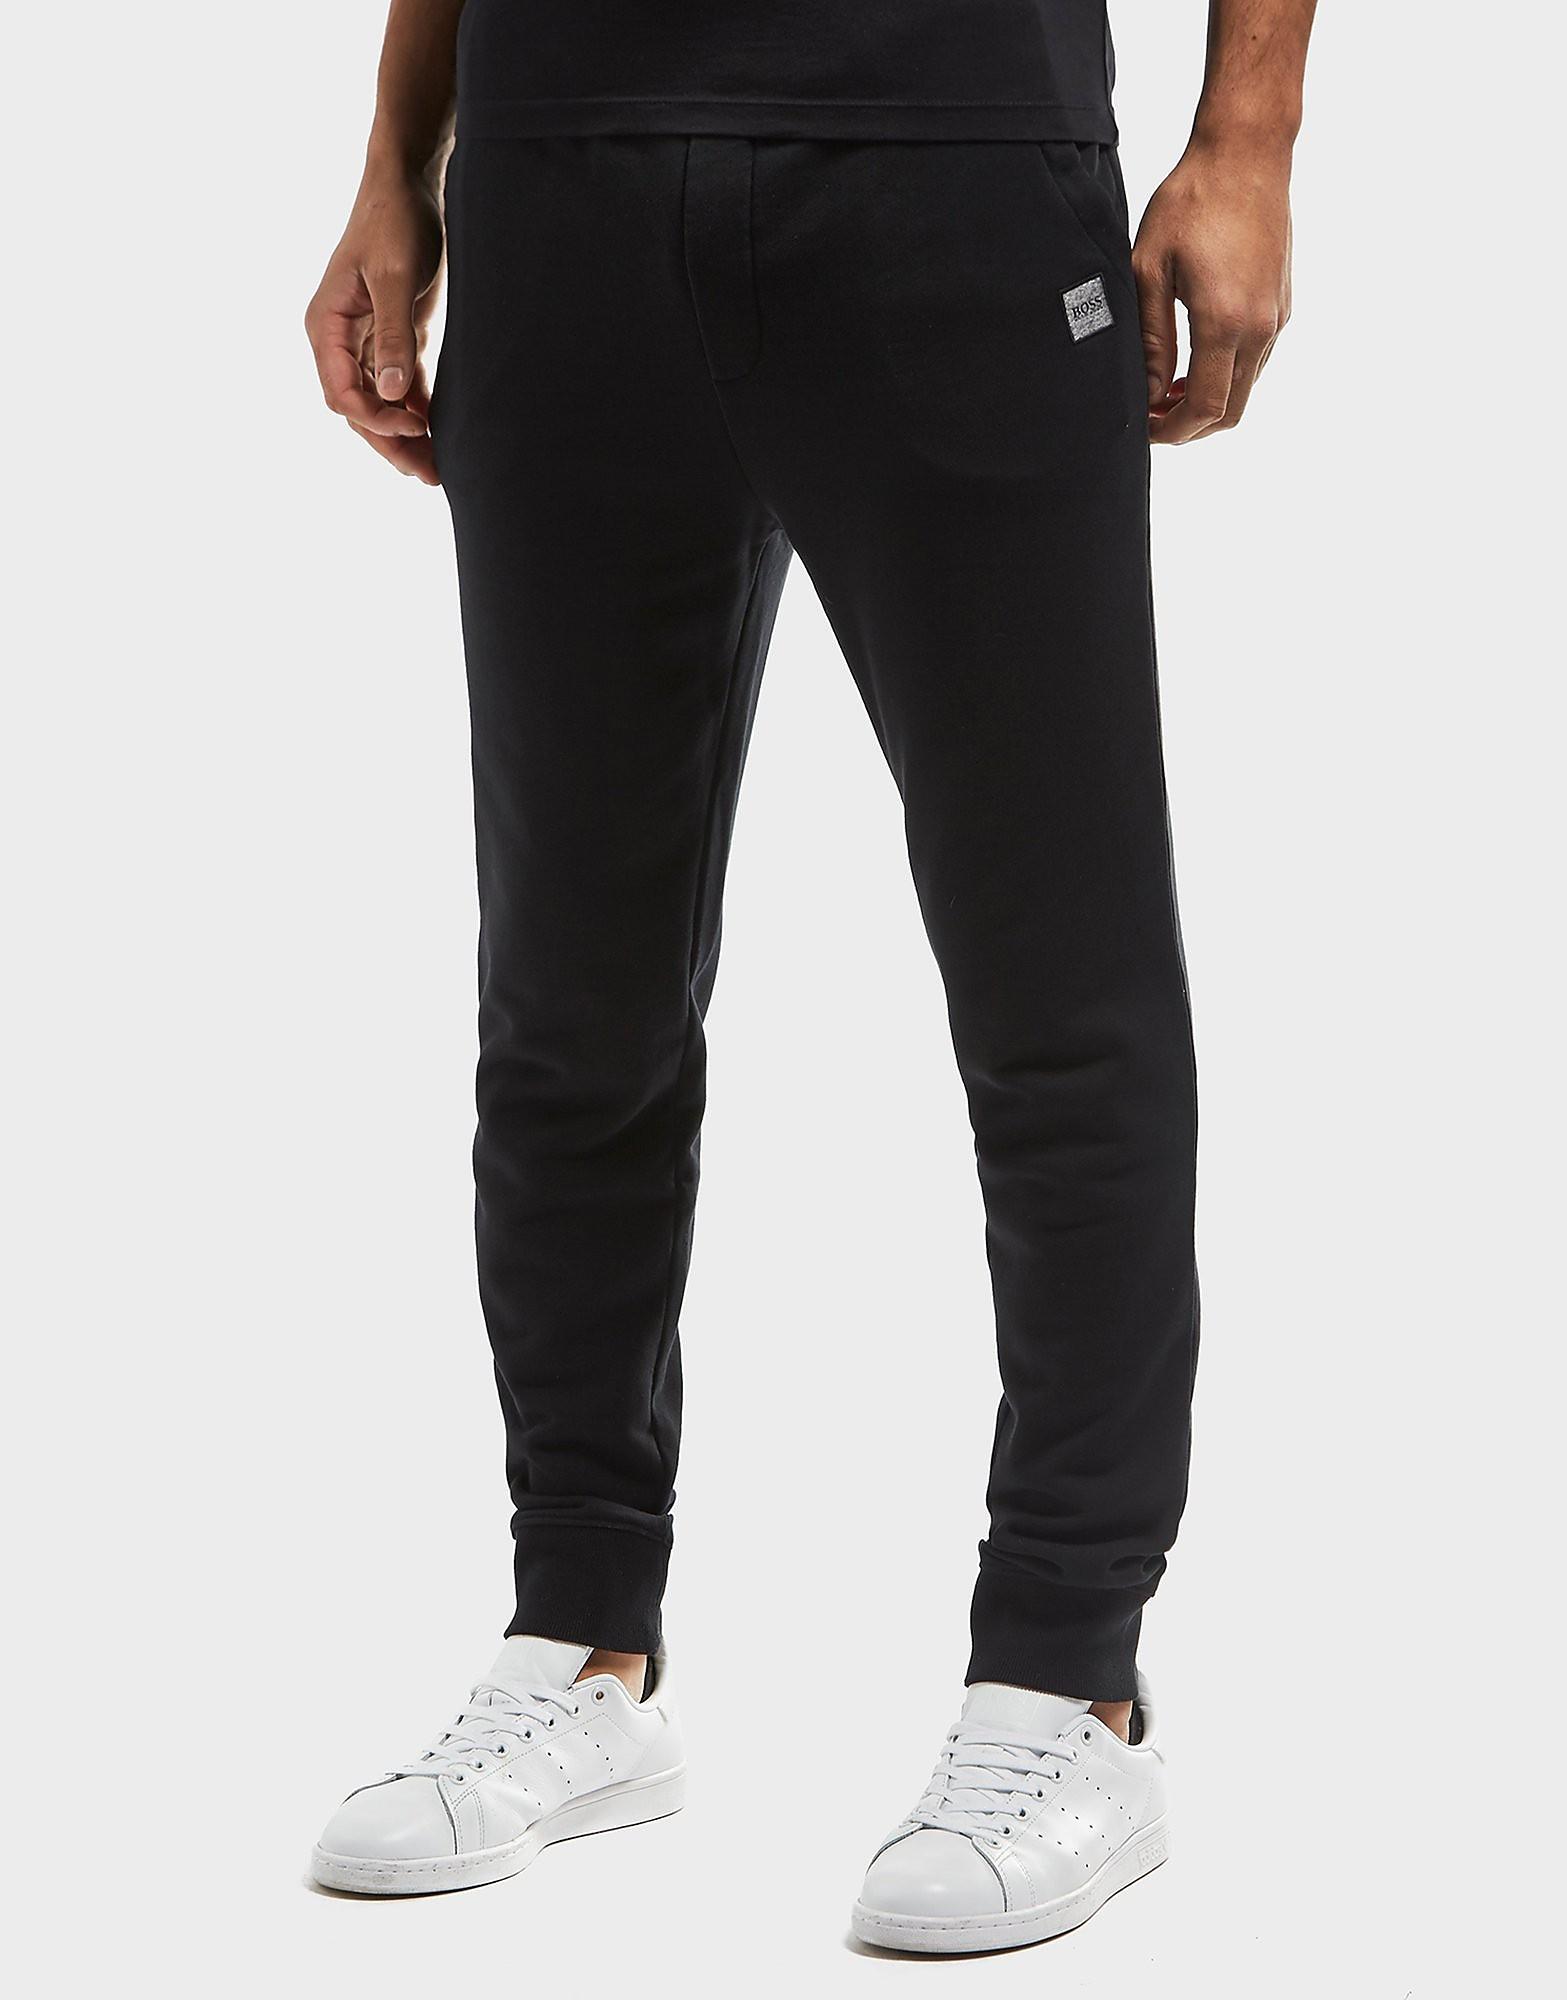 BOSS Orange South Cuff Track Pants